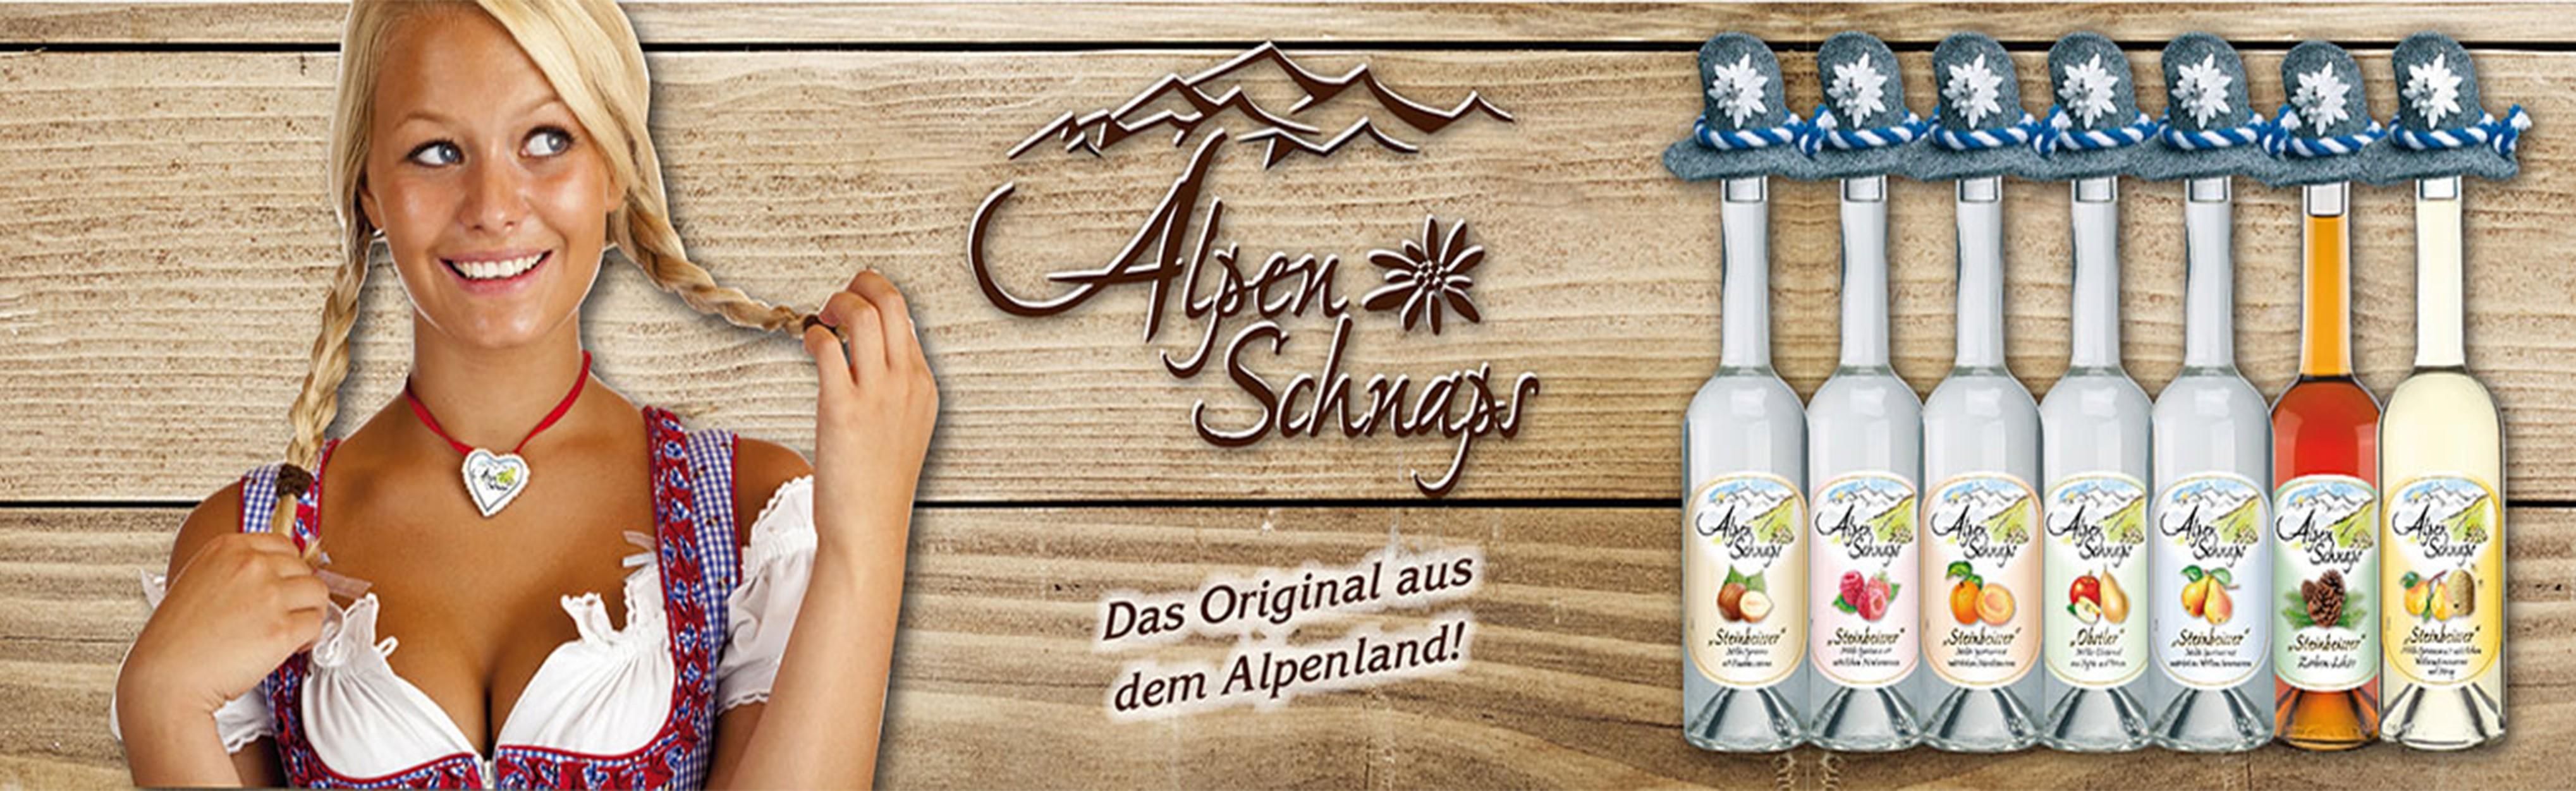 Alpen Schnaps